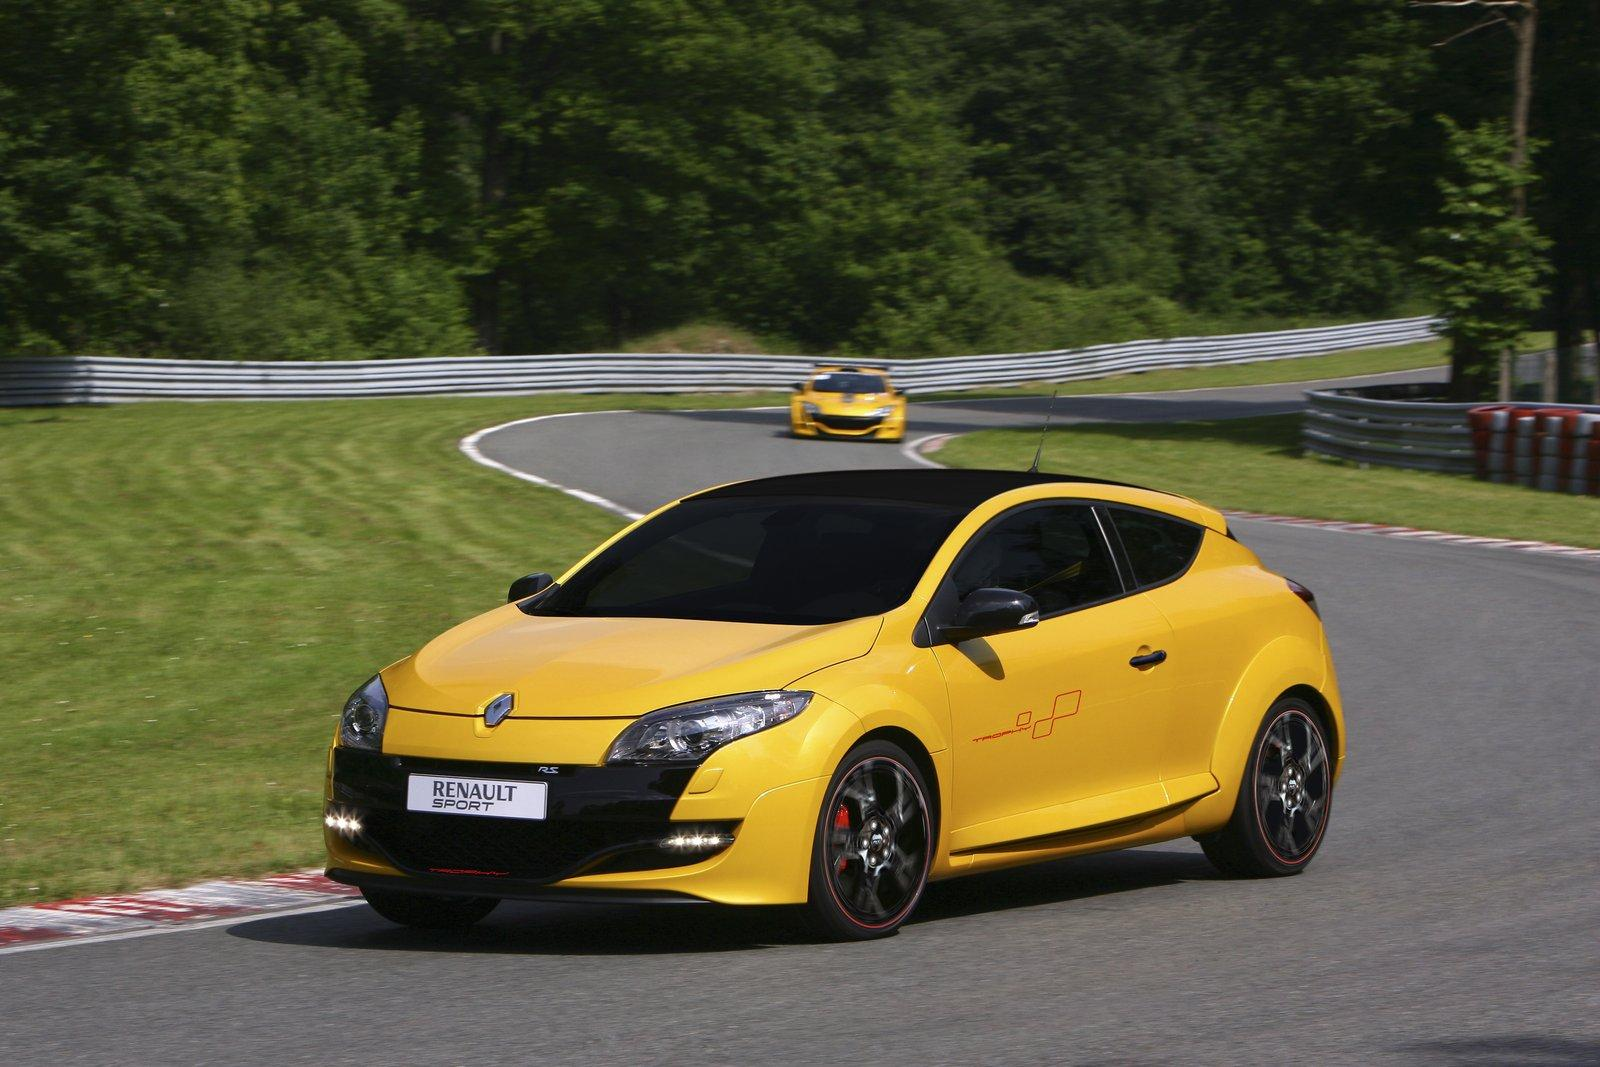 Renaultsport Megane 265 Trophy tuned by K-Tec Racing